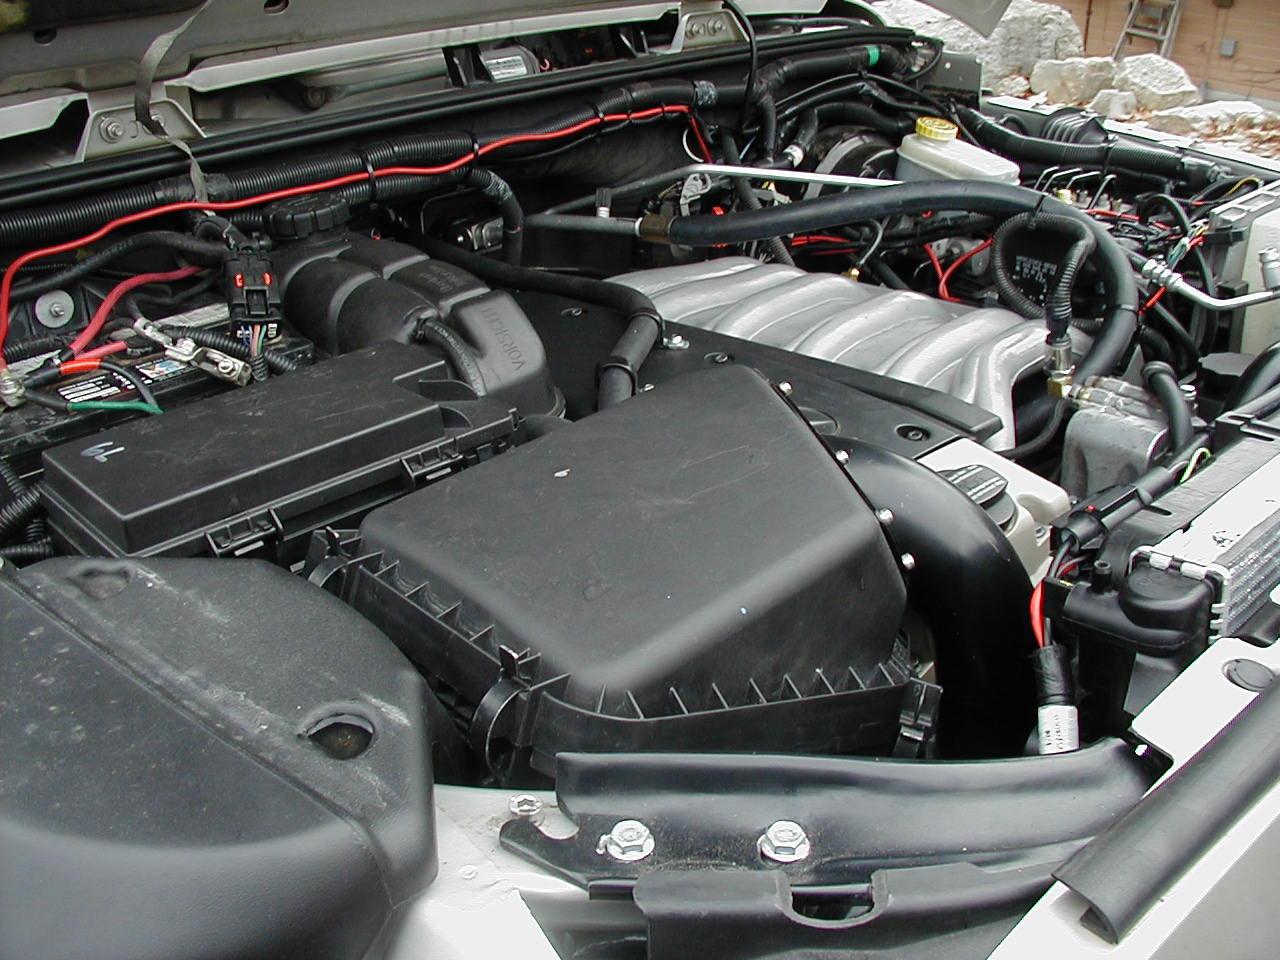 2002 saturn l200 engine choice image hd cars wallpaper om606692 turbodiesel into fj40 sbc swap ih8mud forum p1010004g vanachro choice image vanachro Image collections